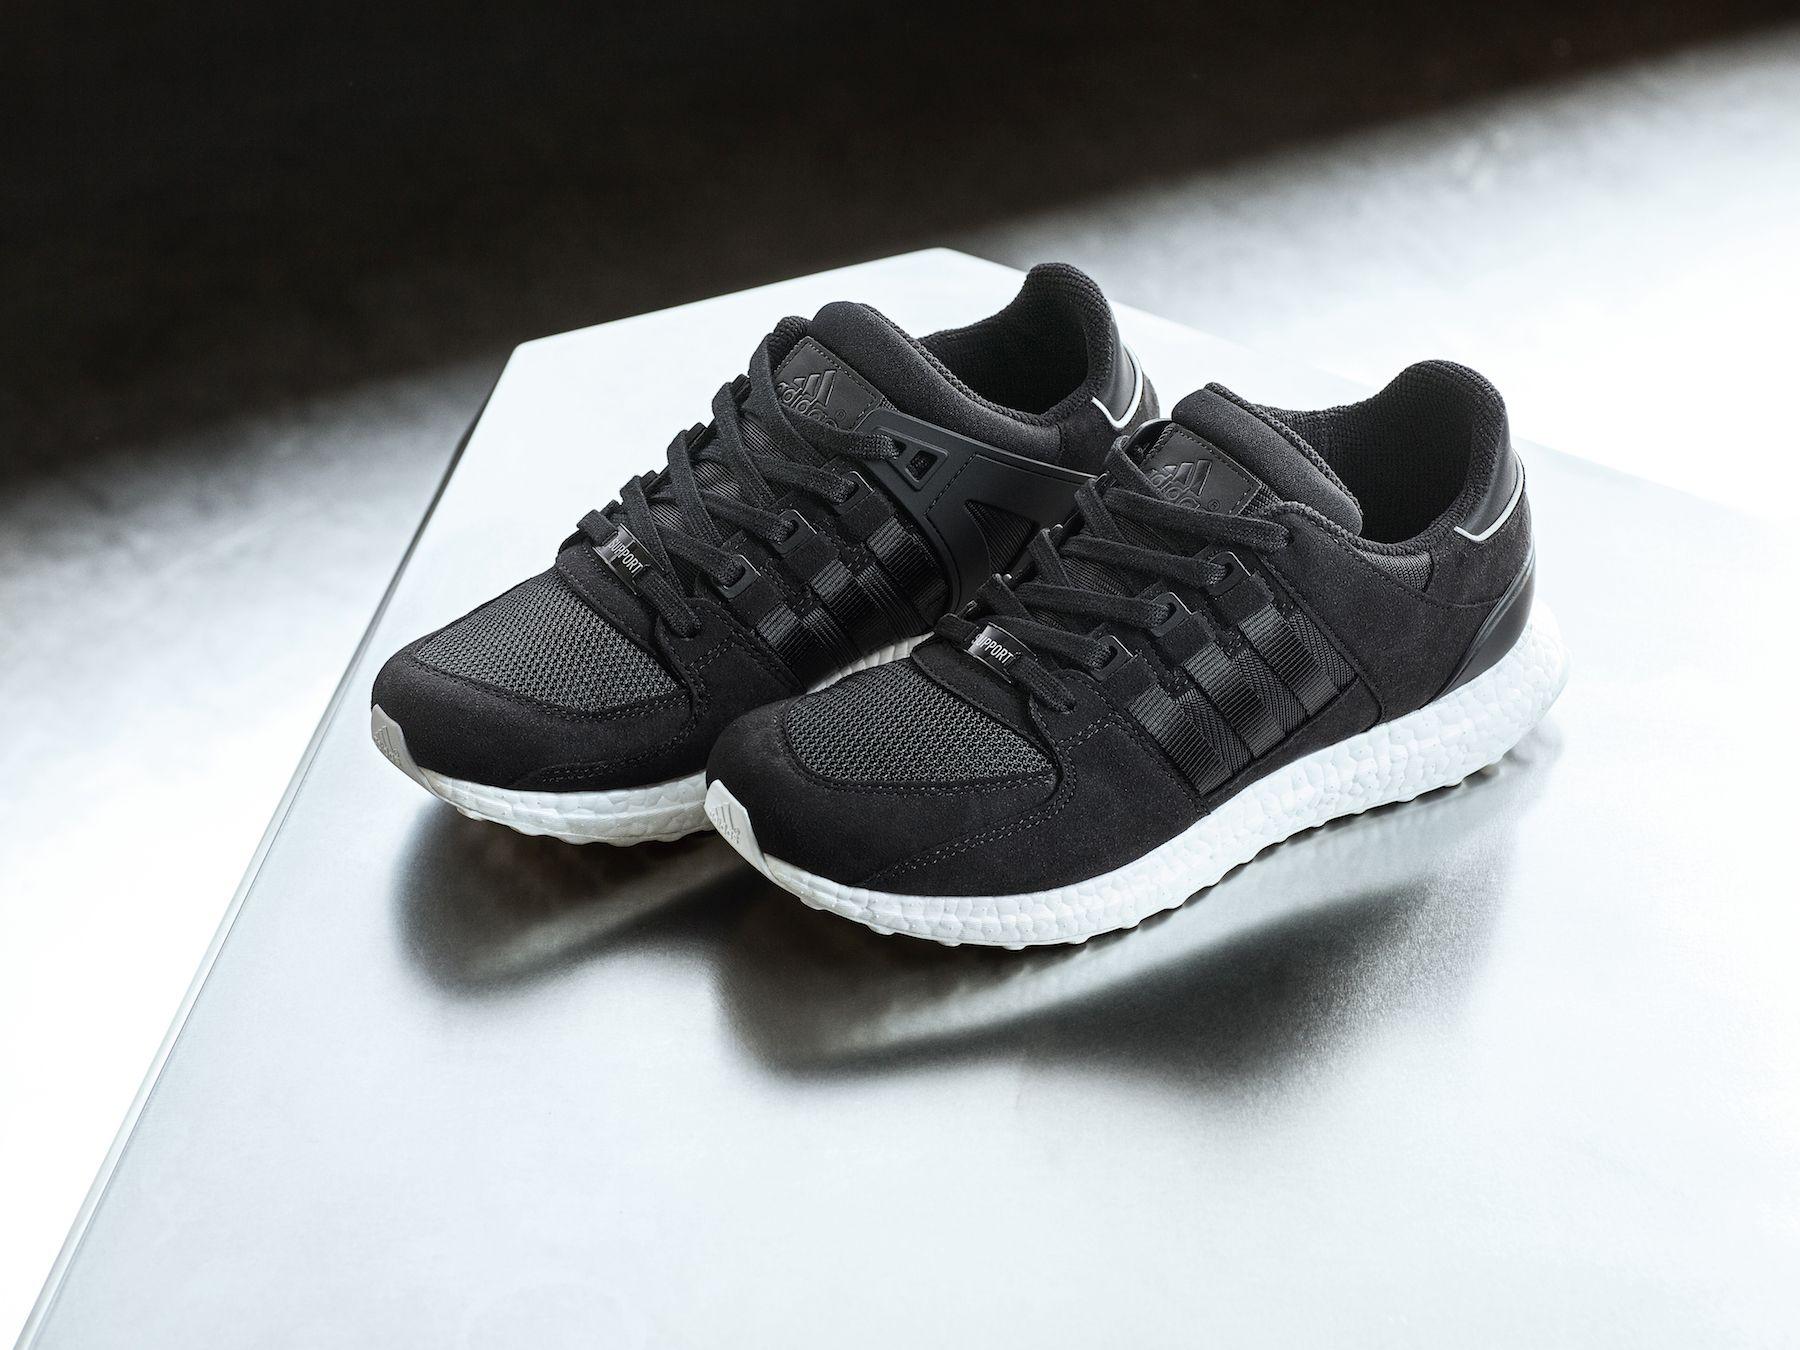 adidas schwarze laufschuhe